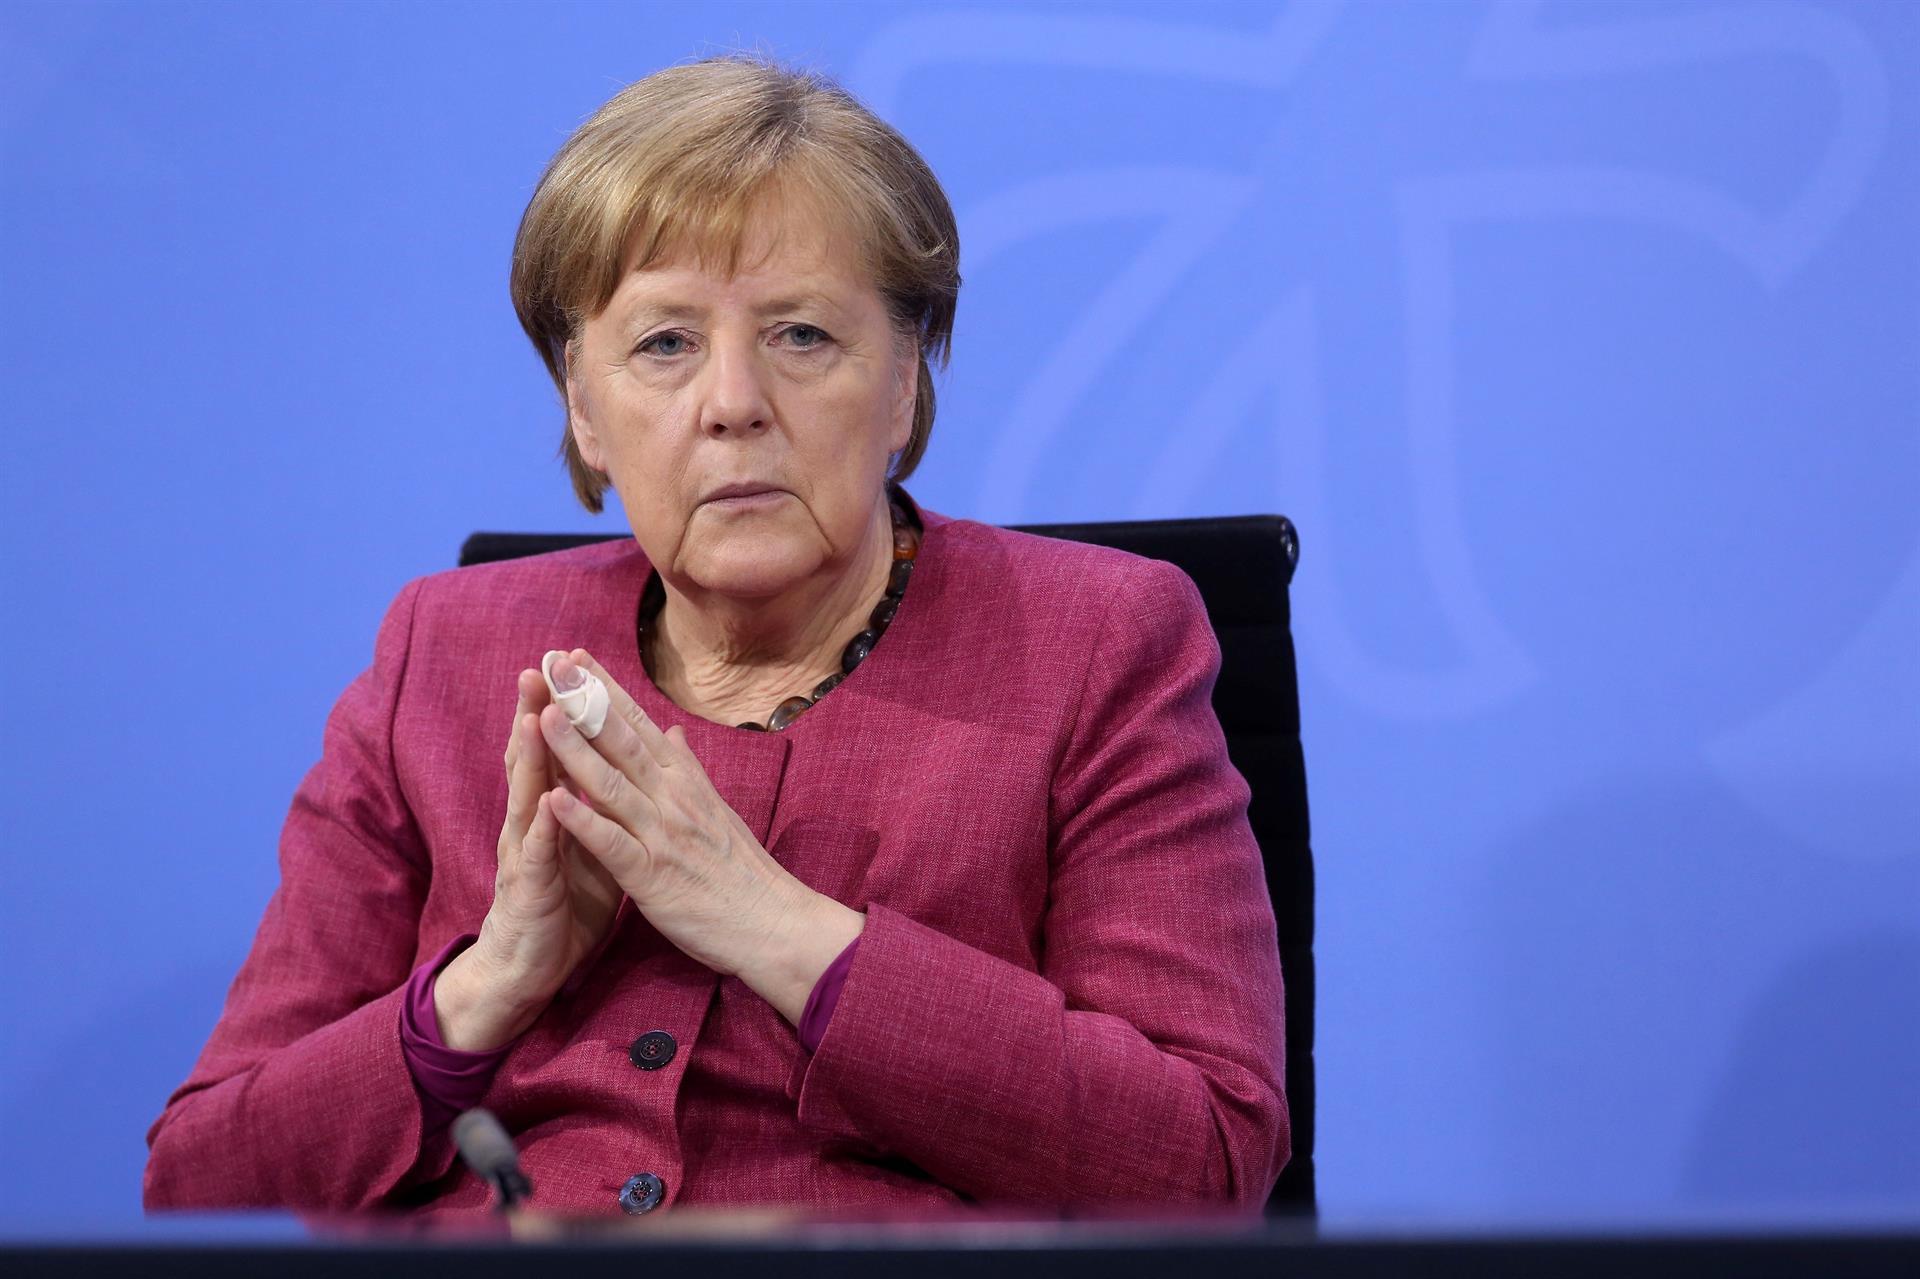 A chanceler alemã, Angela Merkel (CDU), em entrevista coletiva